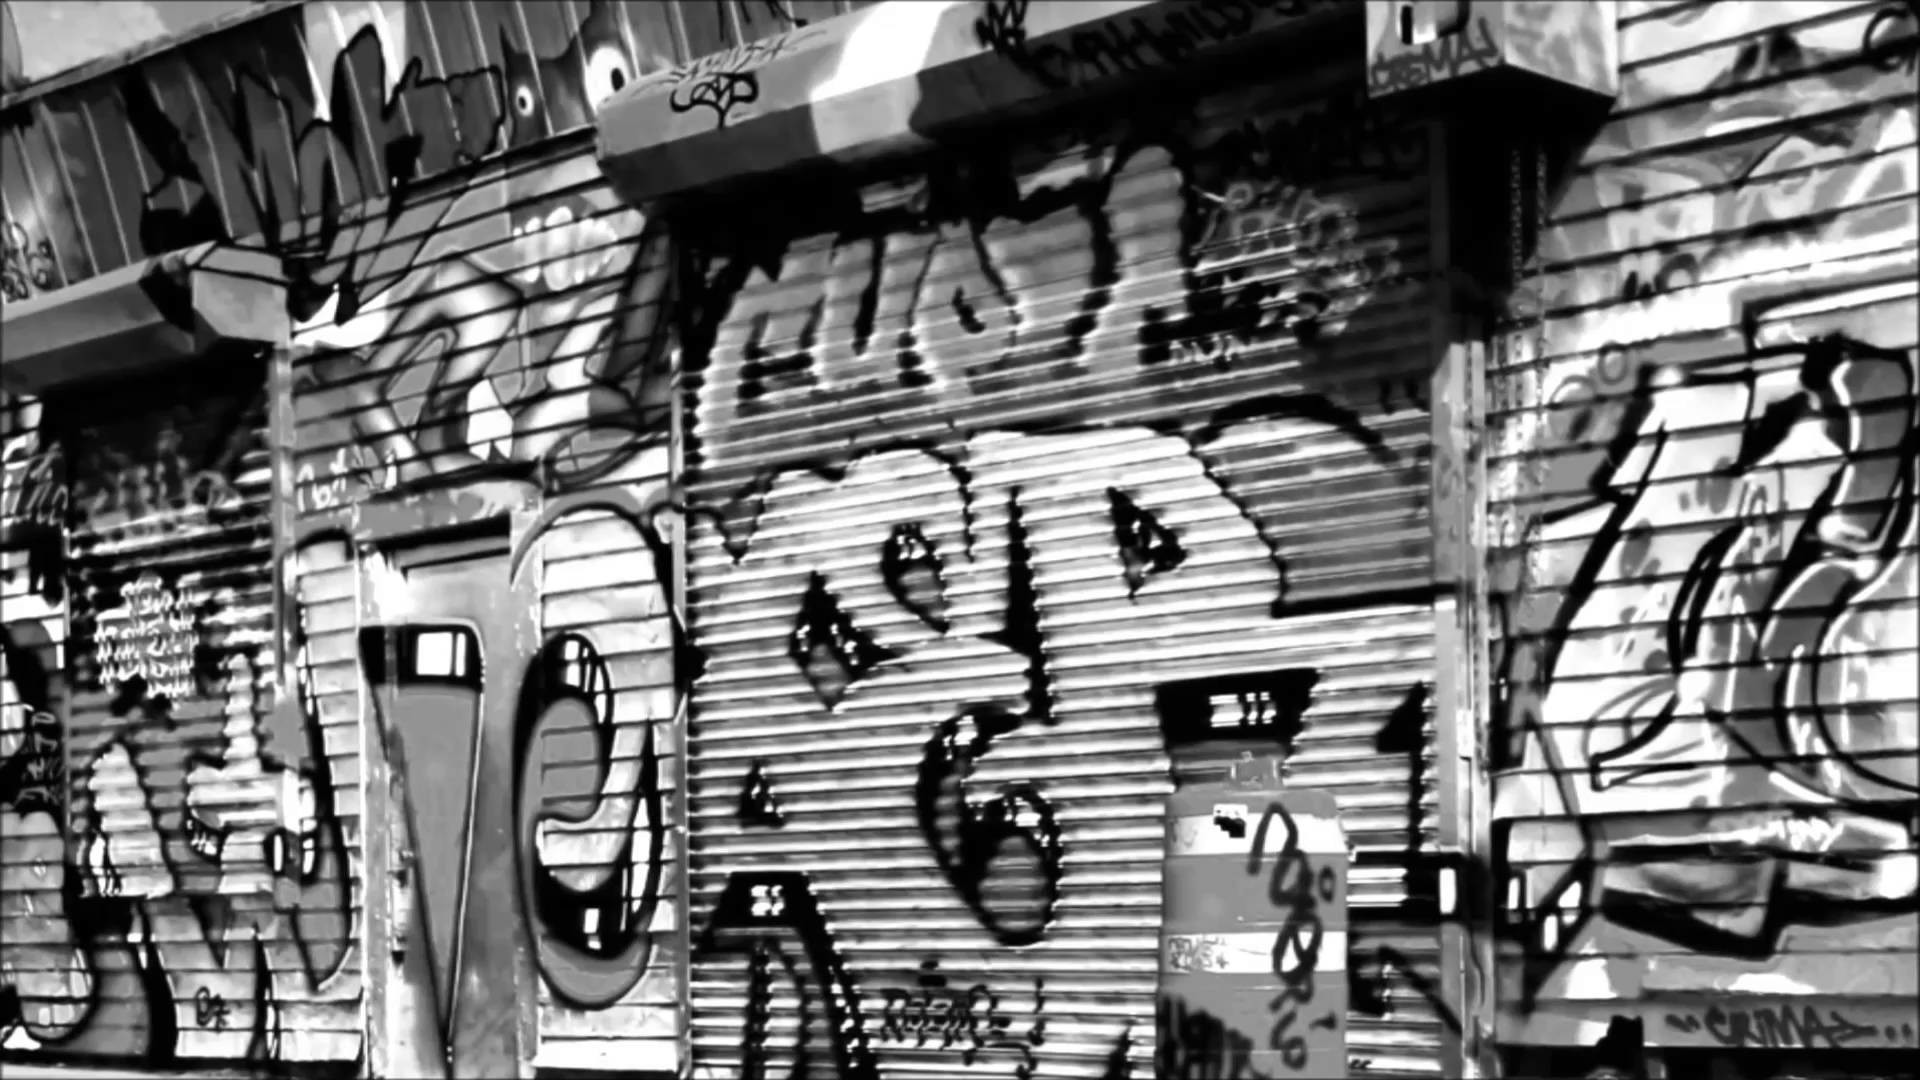 Old School Rap Wallpaper (77+ images)